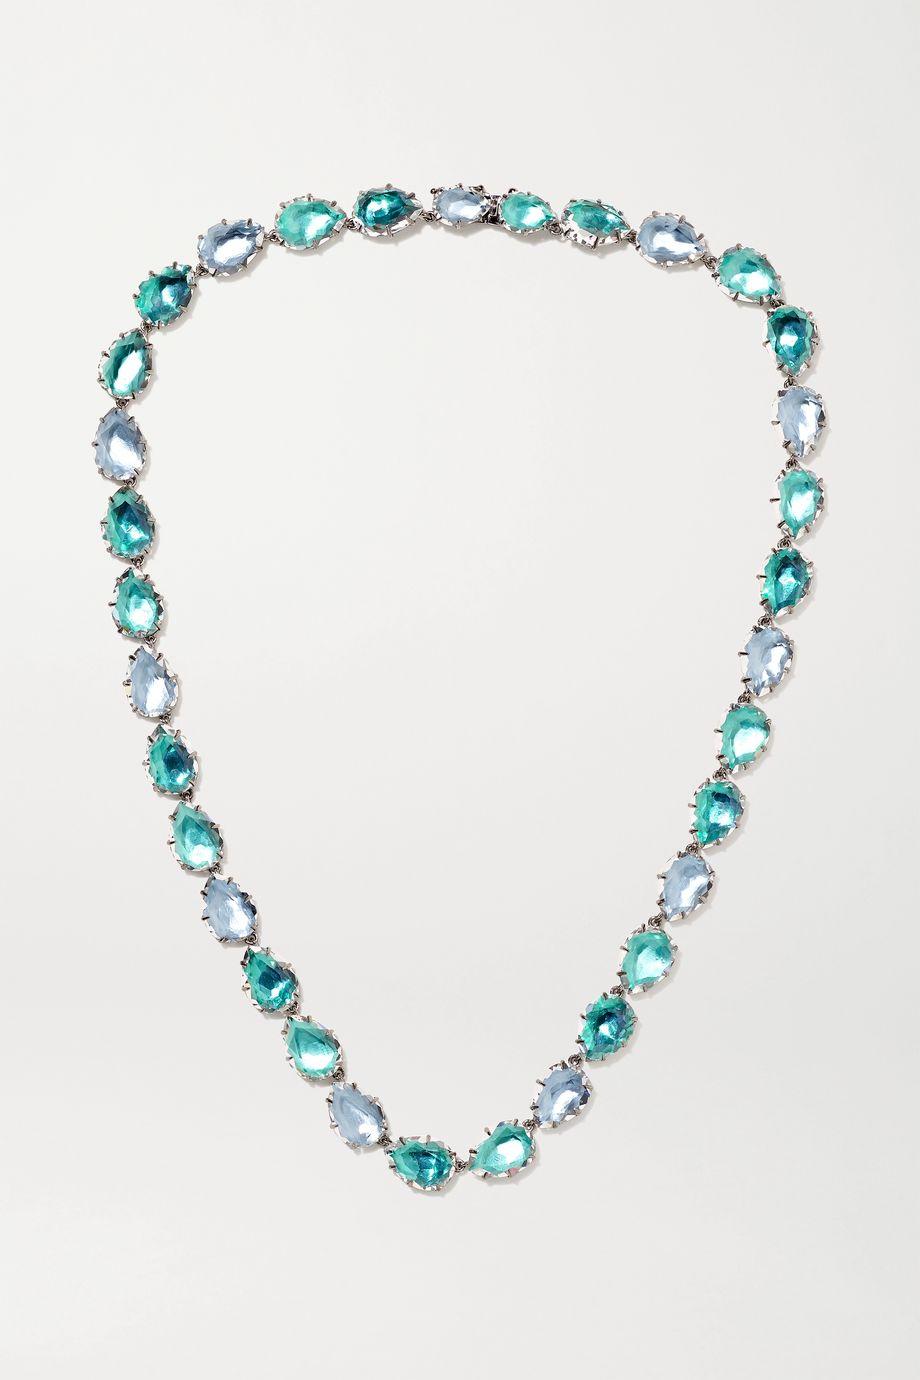 Larkspur & Hawk Caterina Rivière rhodium-dipped quartz necklace